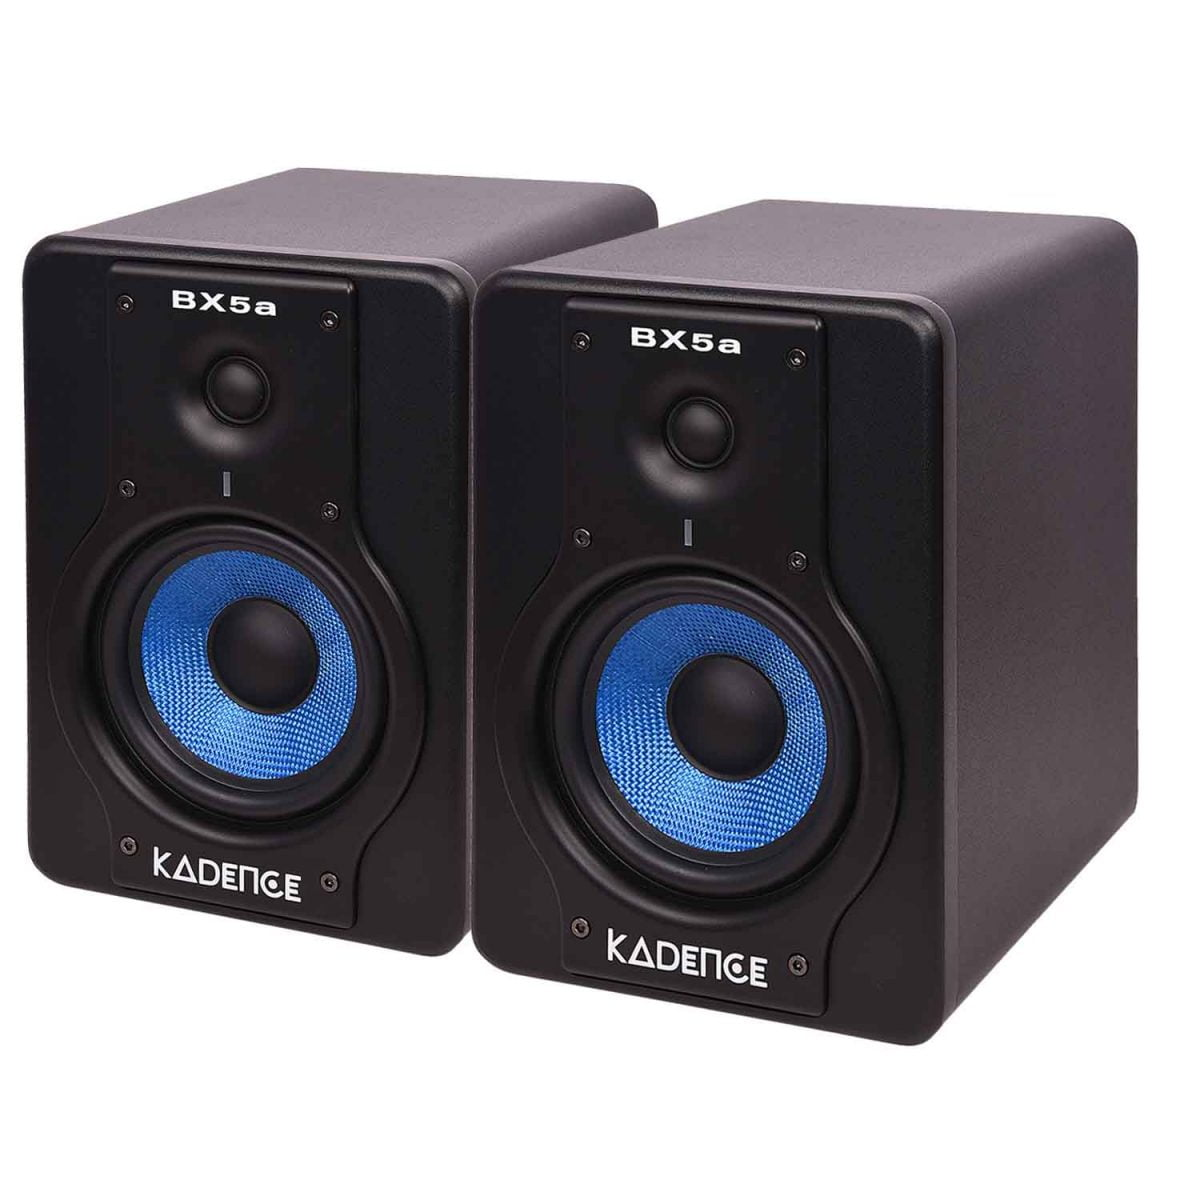 "kadence BX5A 5"" 2-way near-field studio reference monitors"